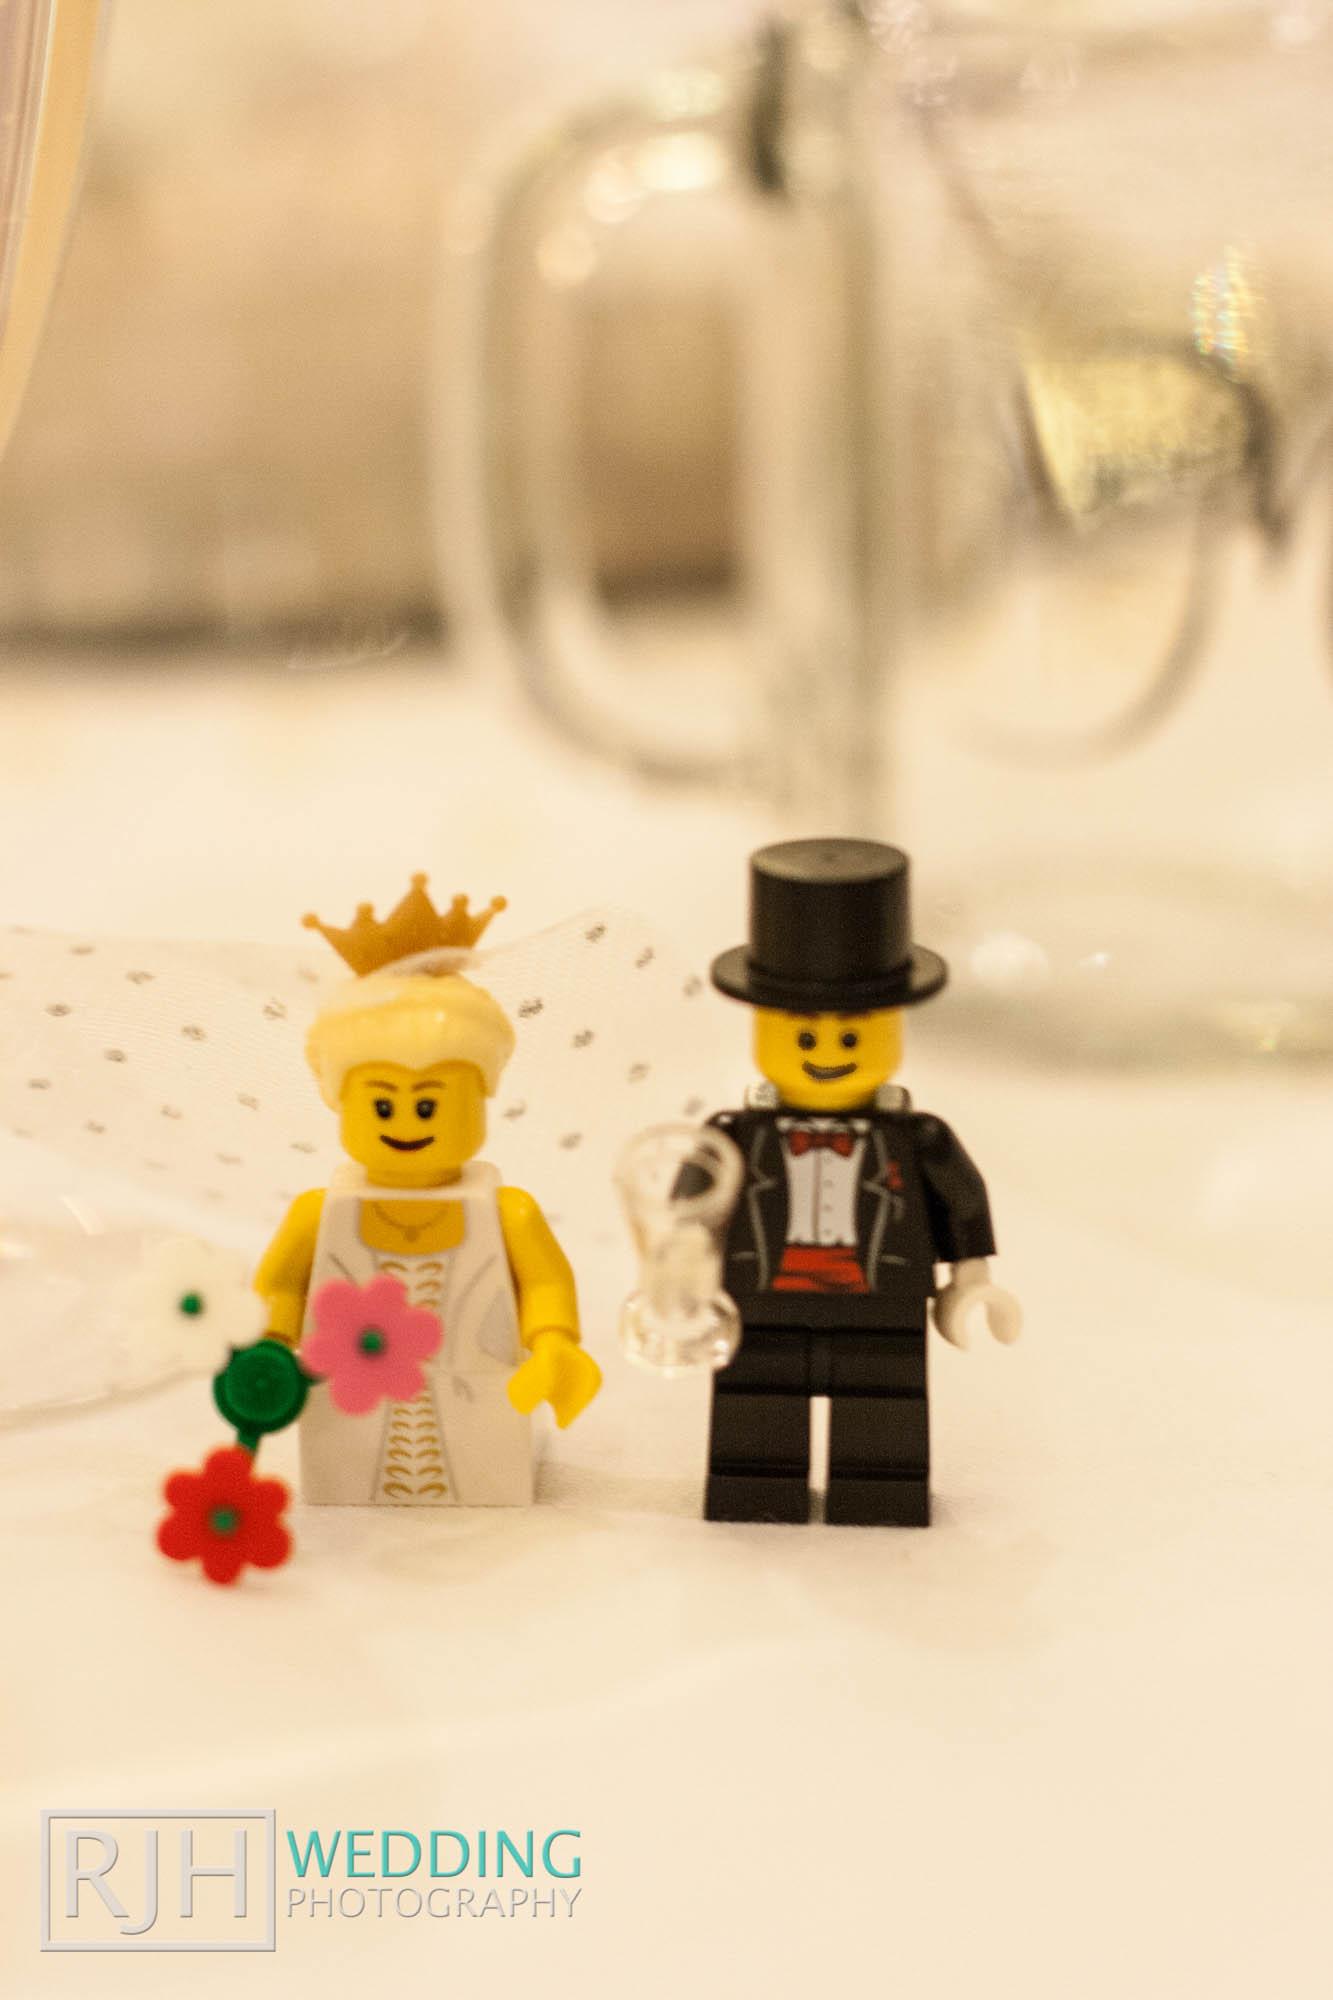 RJH Wedding Photography_2014 highlights_09.jpg